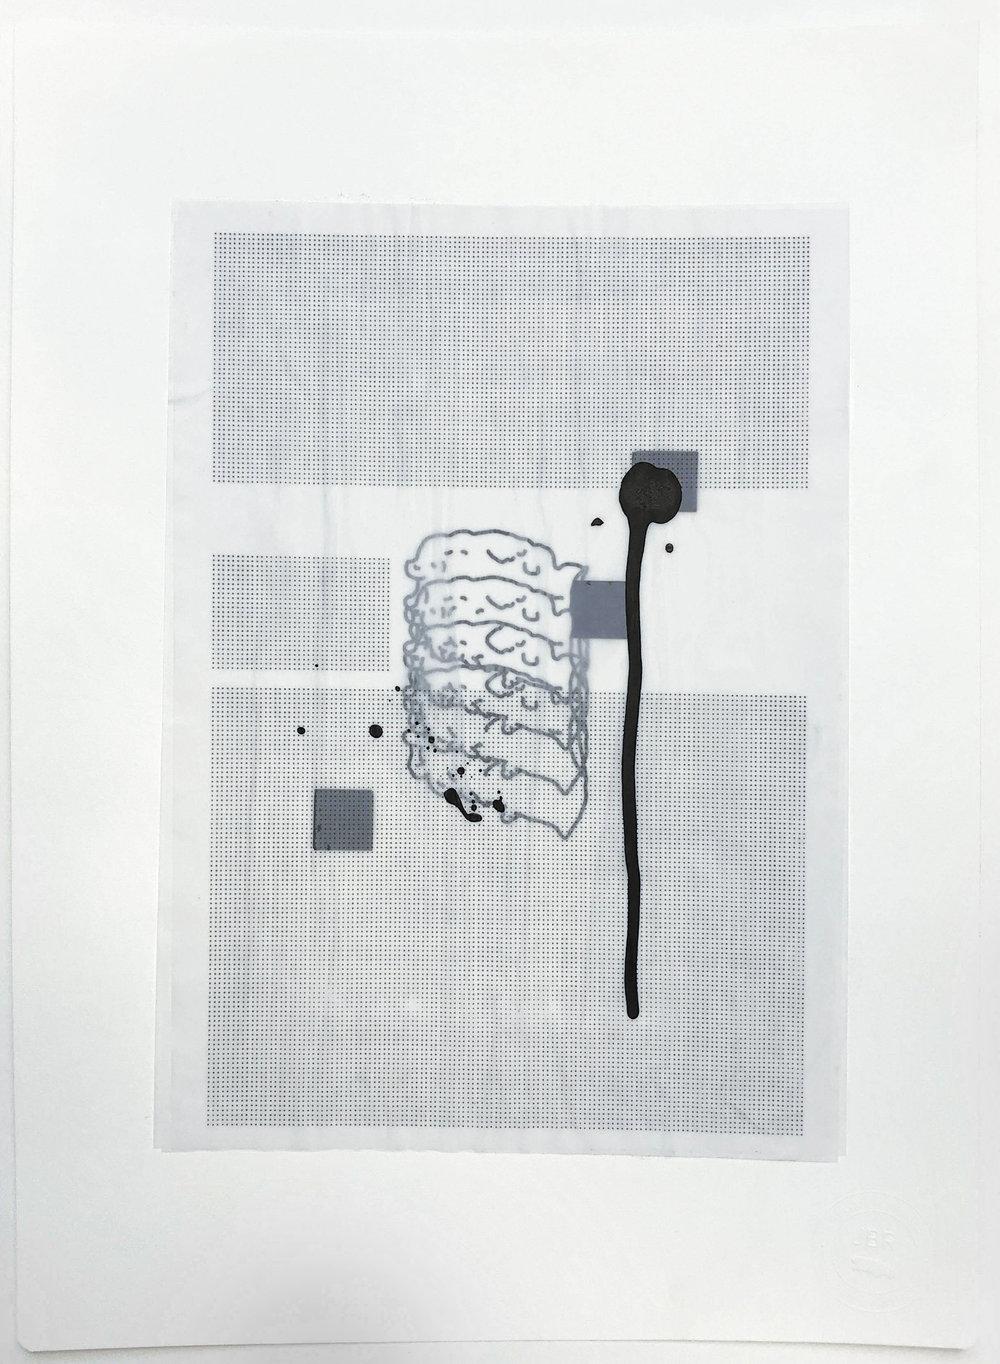 %22Creciente%22- Técnica mixta  - 42 x 30 cm - Julián Brangold - 2018.jpg